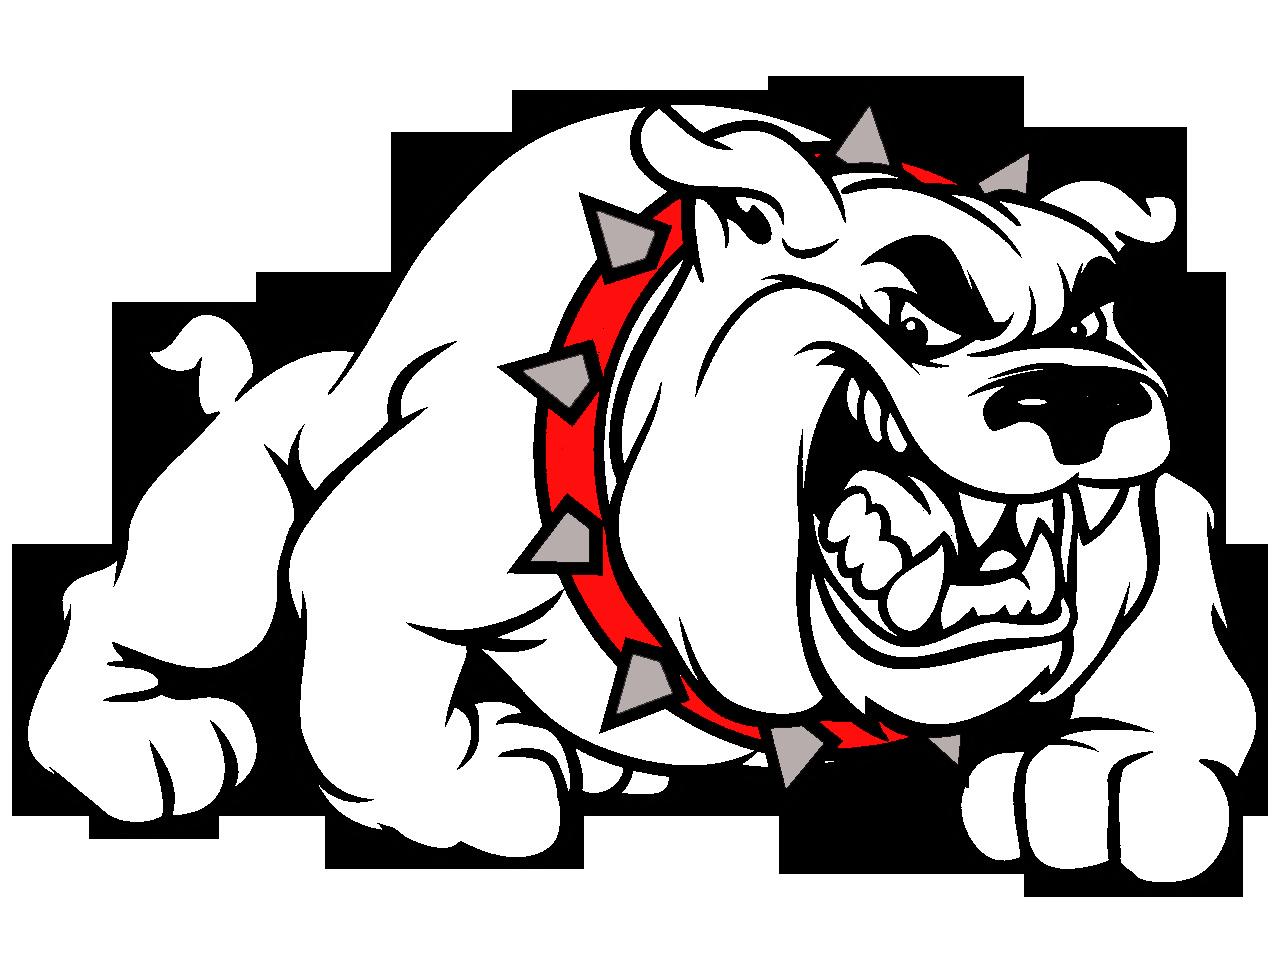 svg stock Bulldog Mascot Clip Art free image